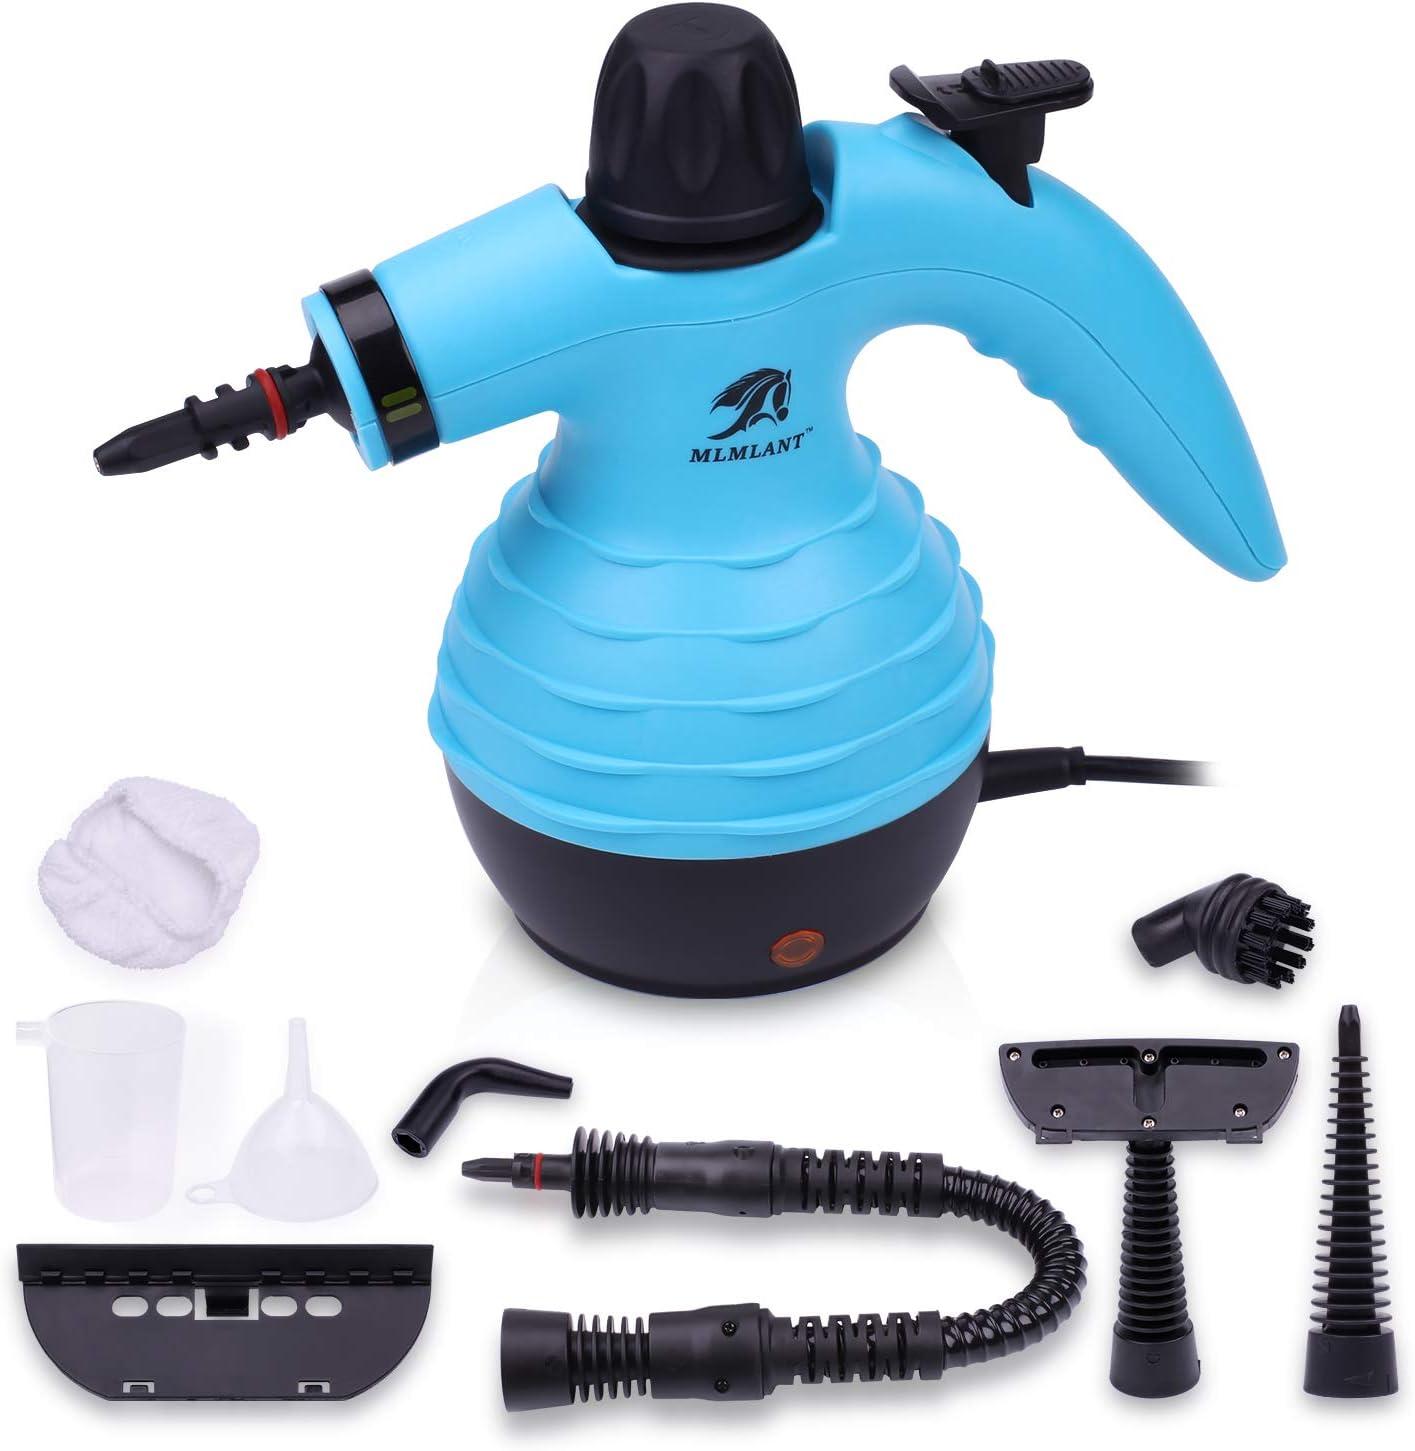 MLMLANT Multipurpose Charlotte Mall Handheld Popular overseas Steam Stea Cleaner 1050W Portable